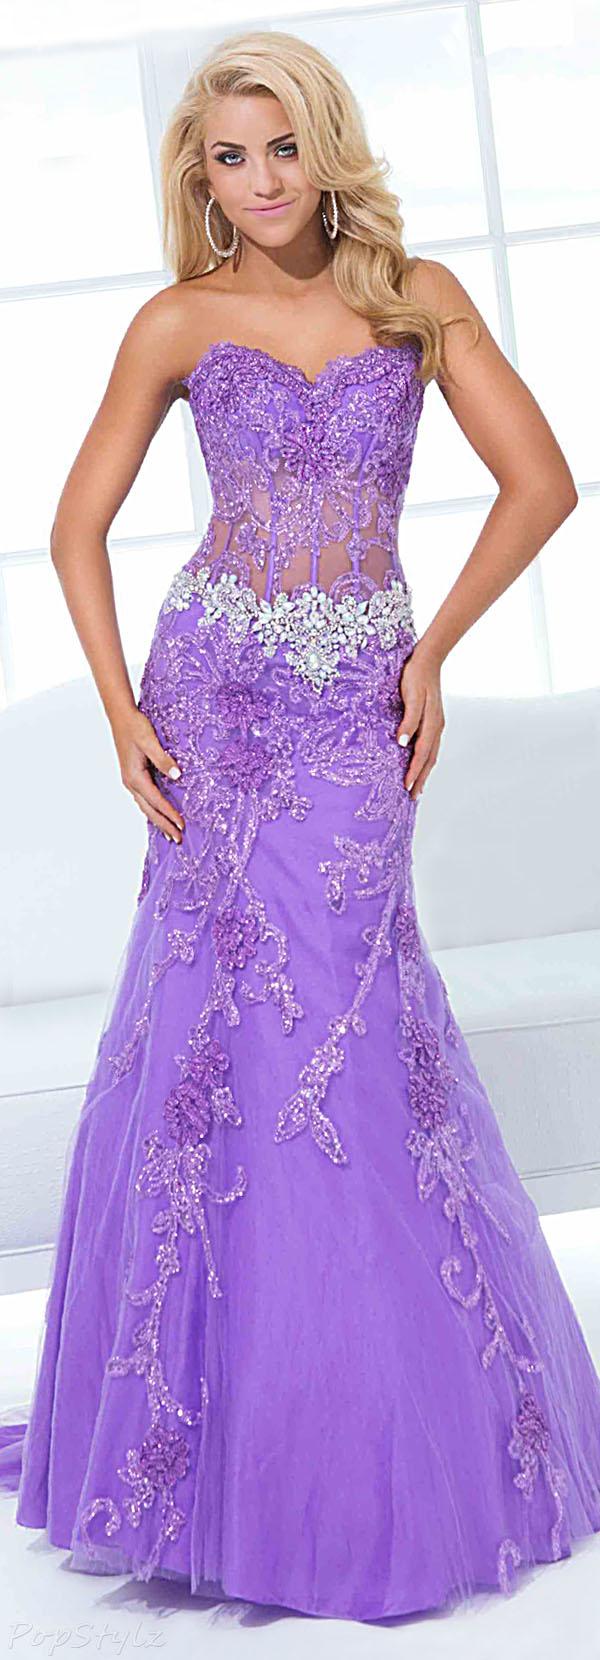 Tony Bowls 114734 Strapless Mermaid Dress